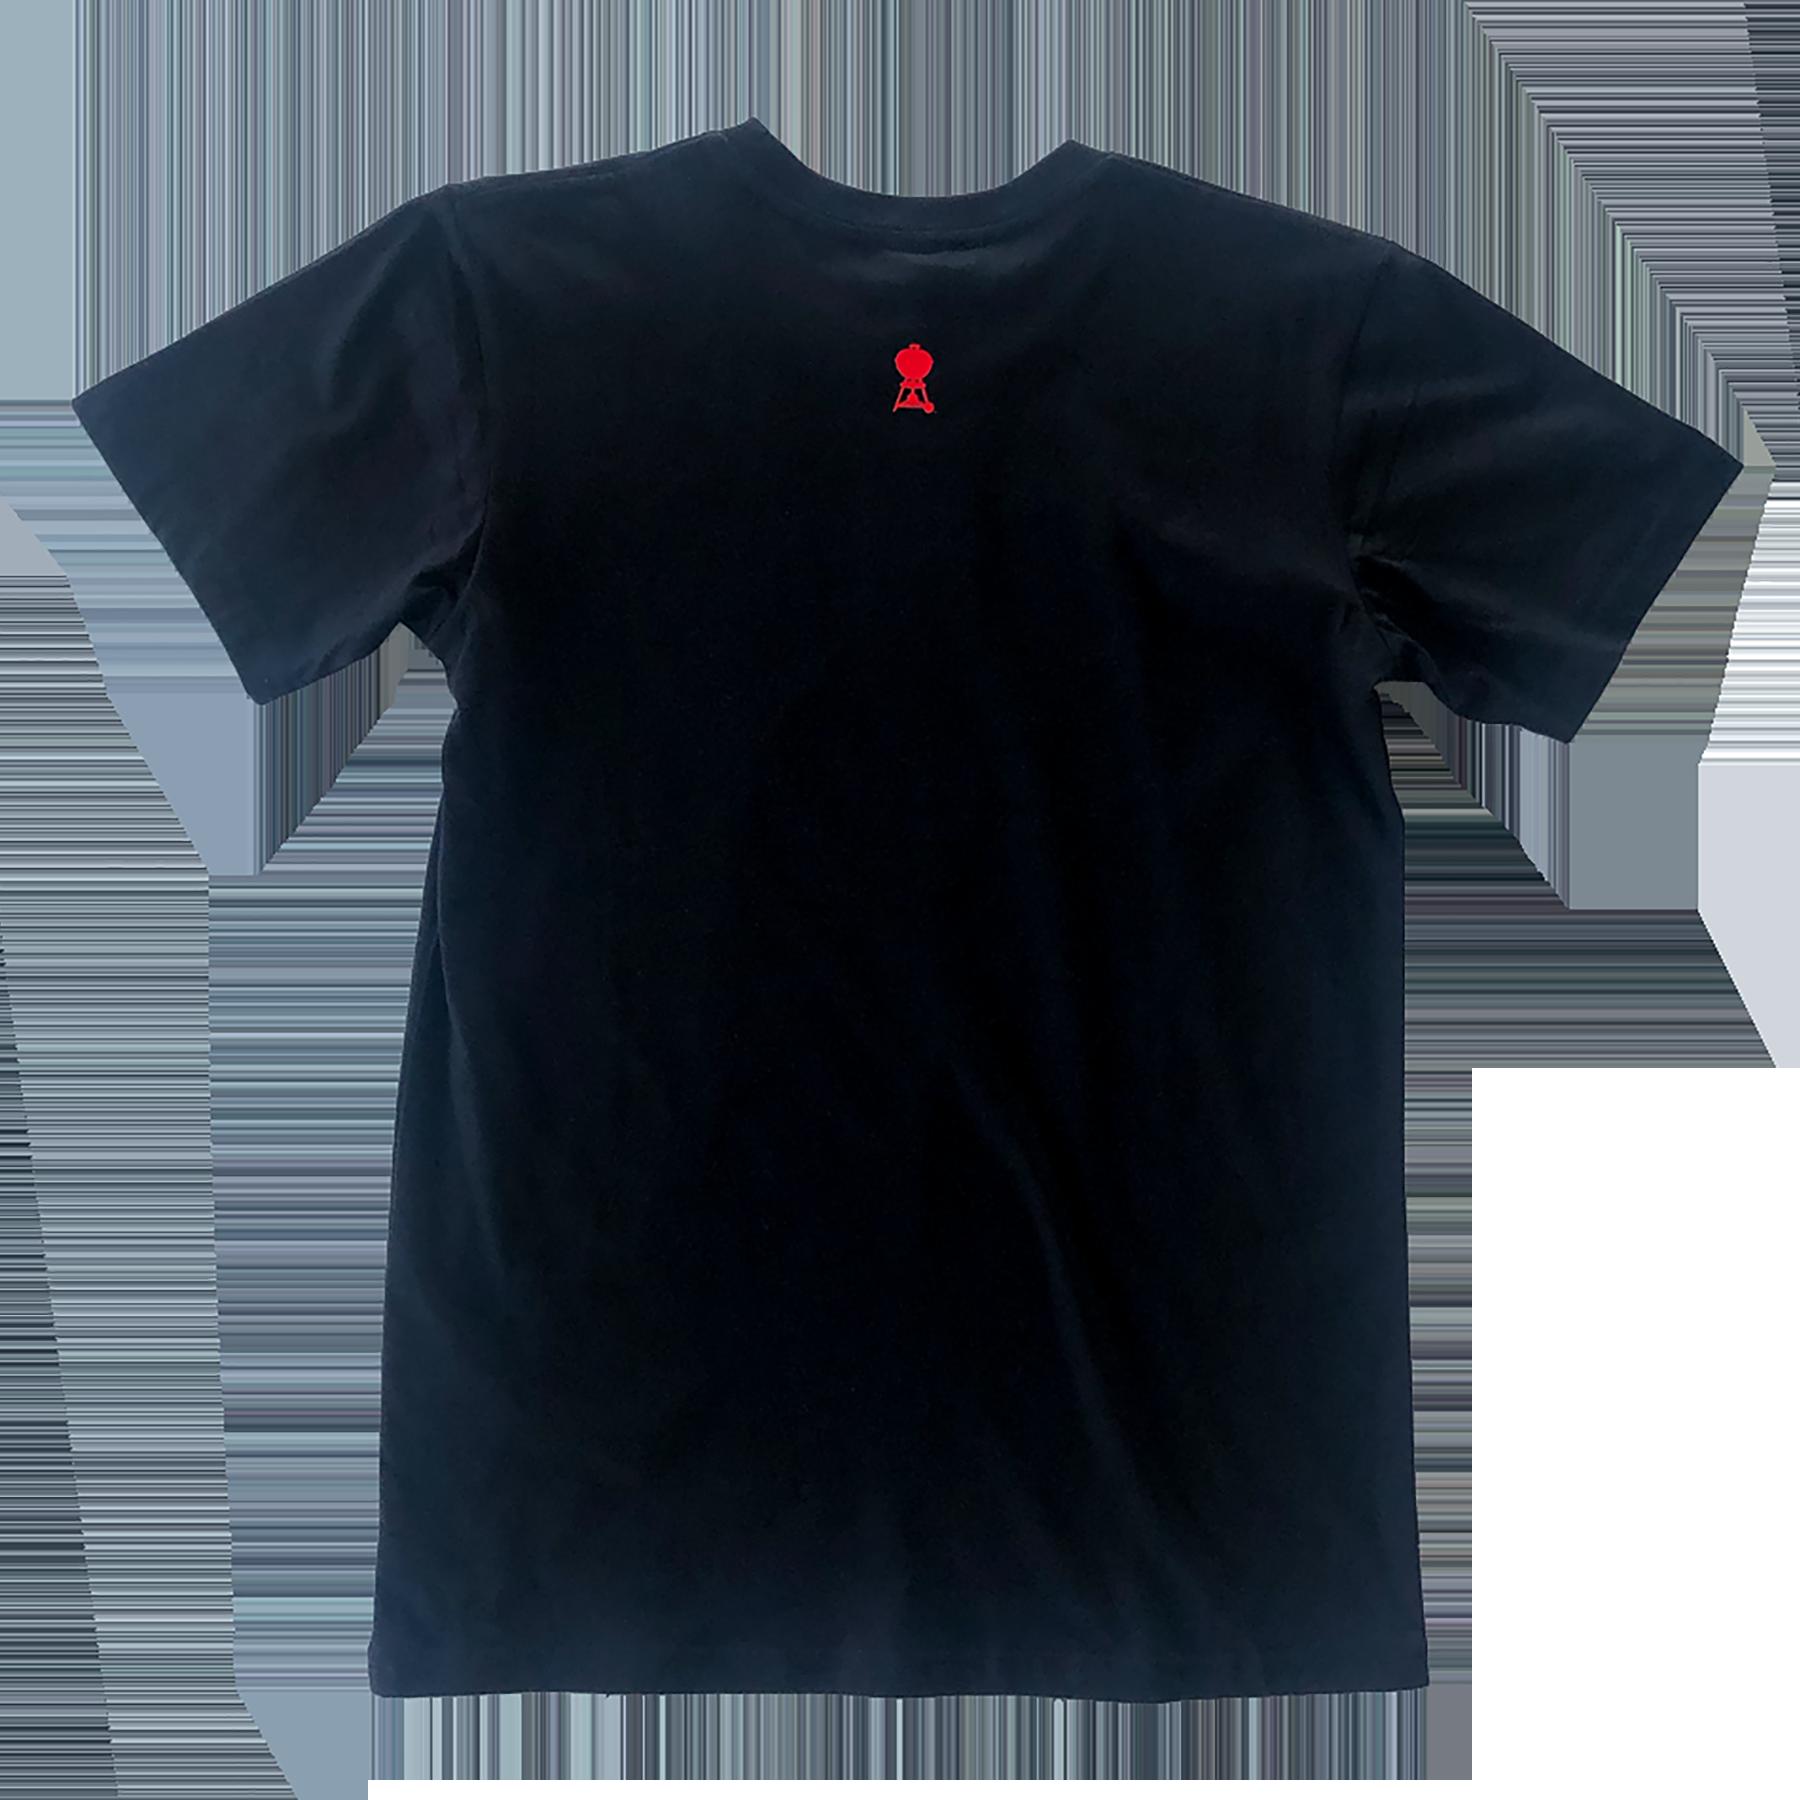 18047-Retro-t-shirt-black-back_1800-x-18000